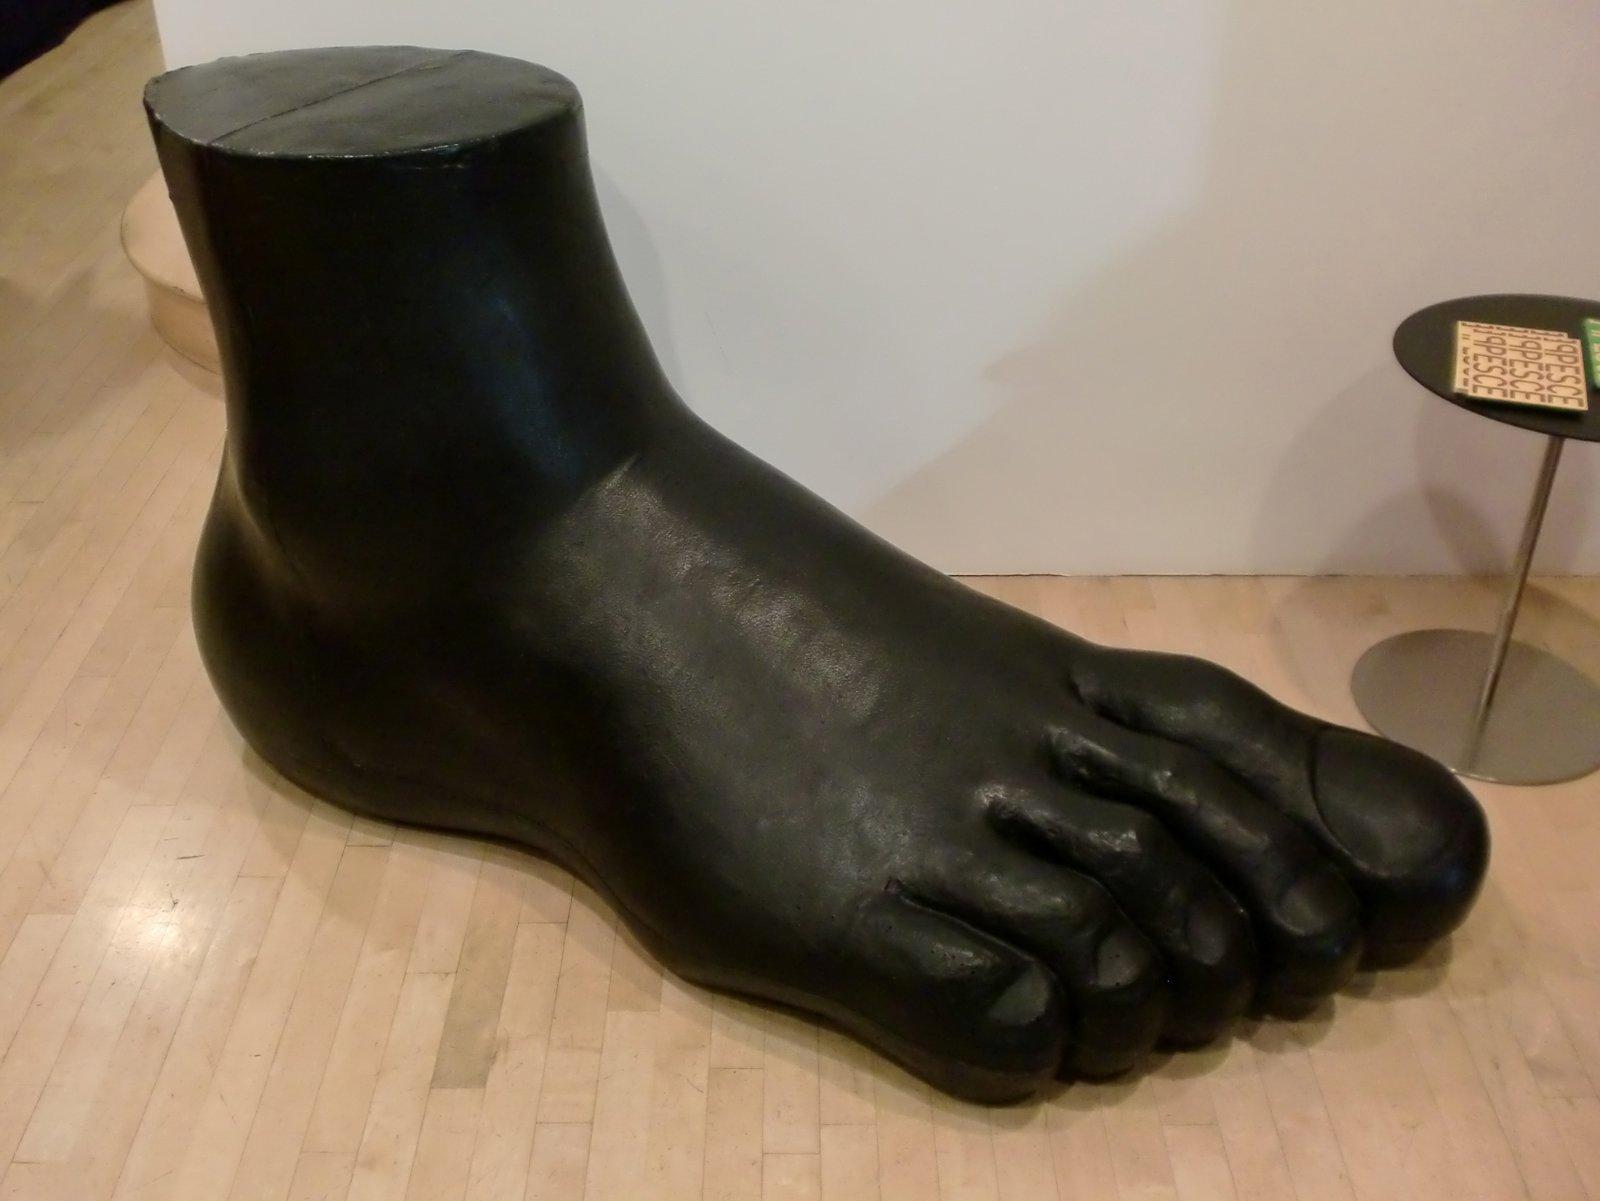 "The Up 7 was designed in 1969 of self-skinning molded polyurethane foam.  Search ""사설사다리총판구인 【텔레그램XZ114】 걱정 없는 정산에 확실한 보안 유지 토토본사 직원 총판구인 7"" from Pieces from a Larger Puzzle"